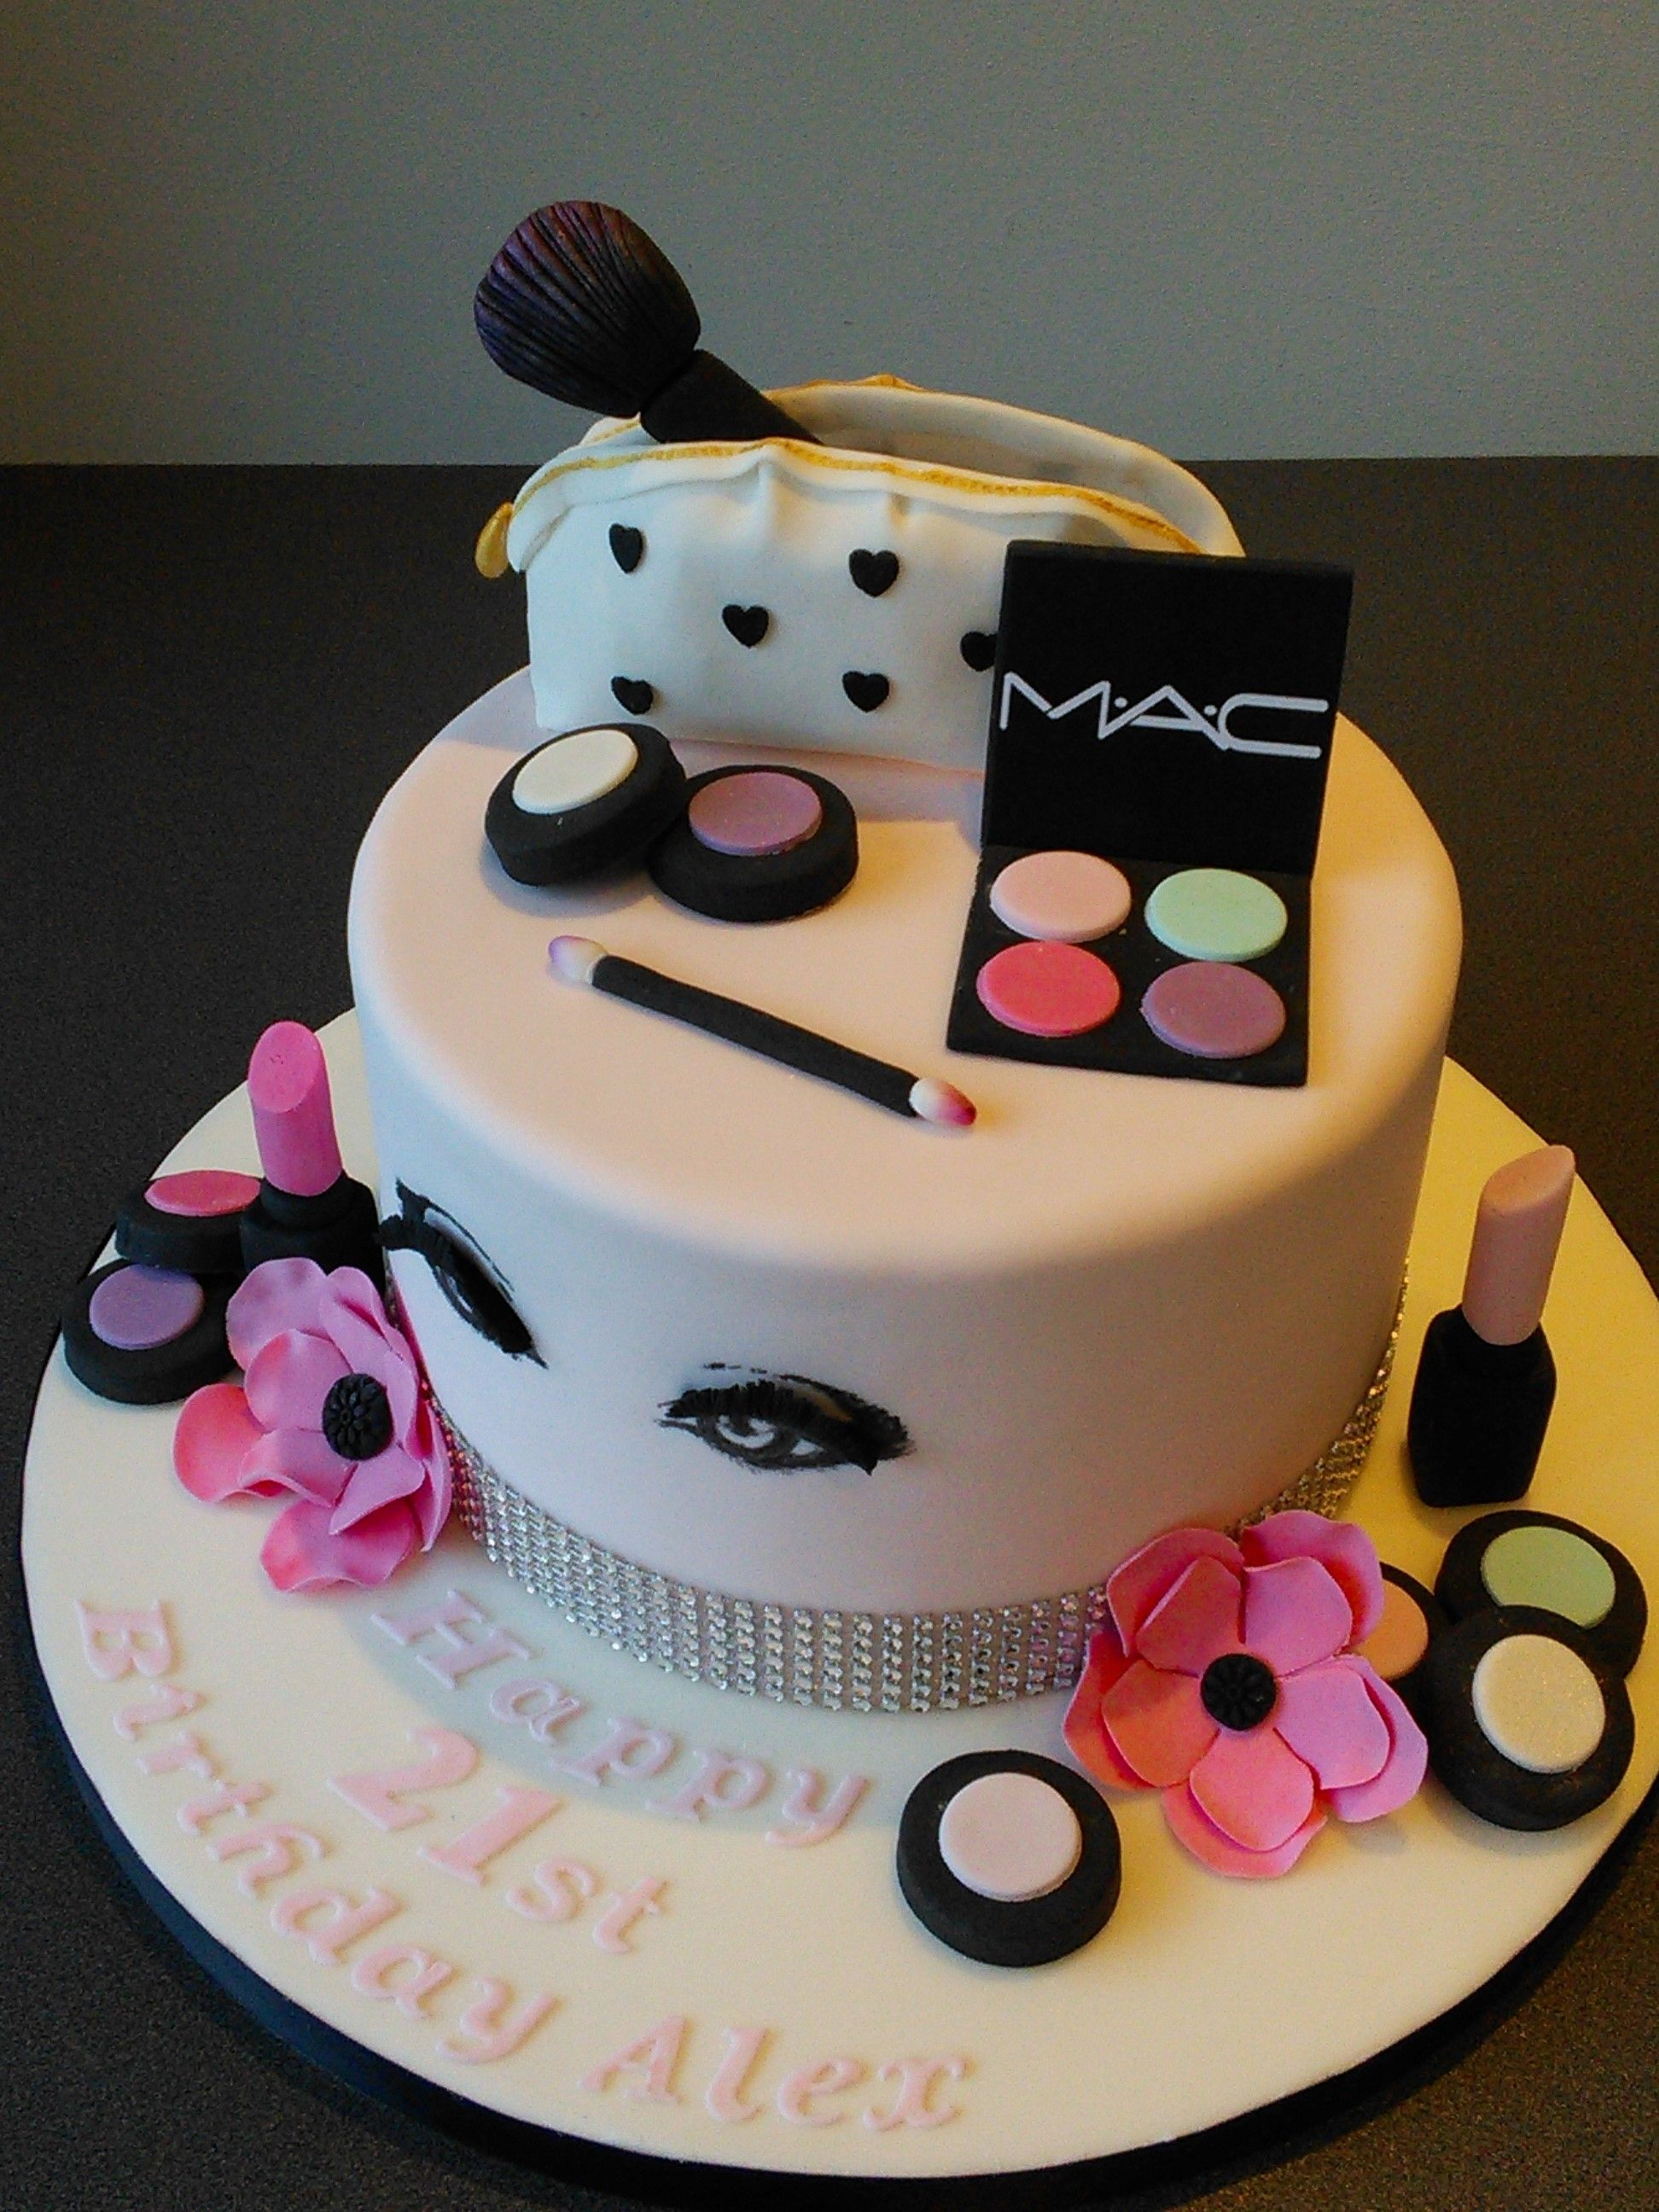 Mac Cosmetics 21st Birthday Cake Make Up Bag With Pink